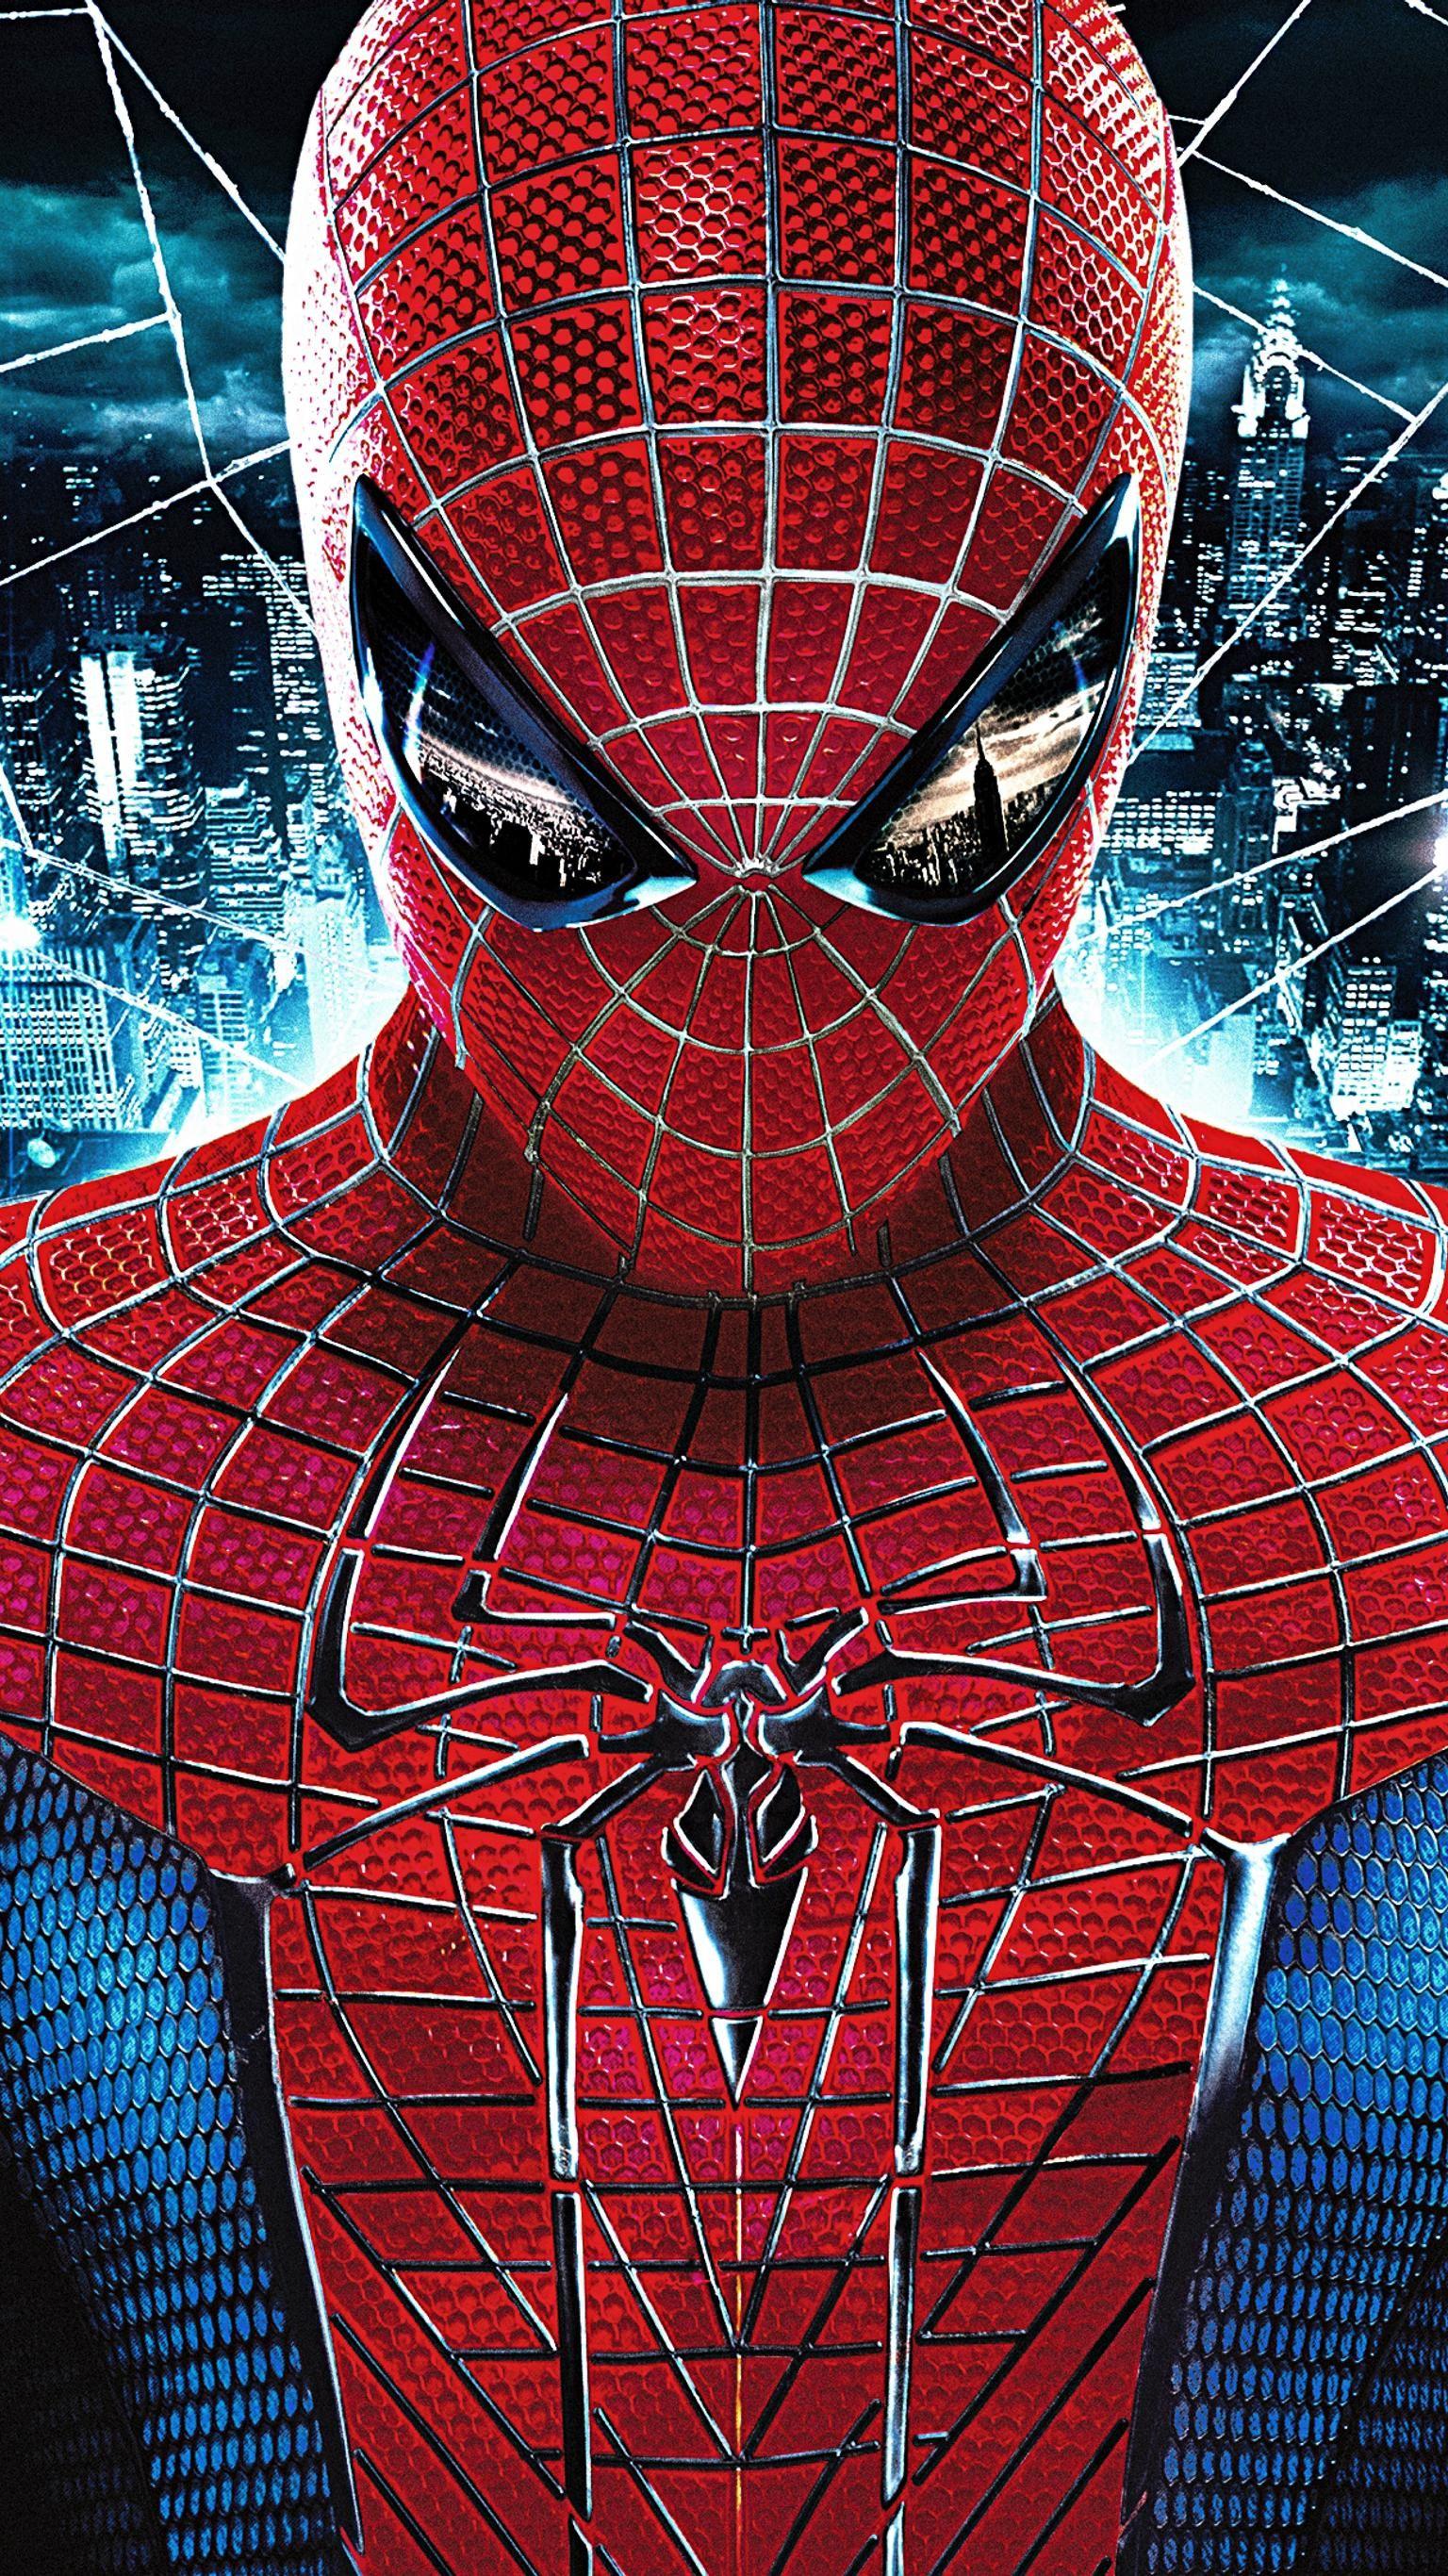 The Amazing Spider Man 2012 Phone Wallpaper Moviemania Amazing Spiderman Marvel Comics Wallpaper Spiderman